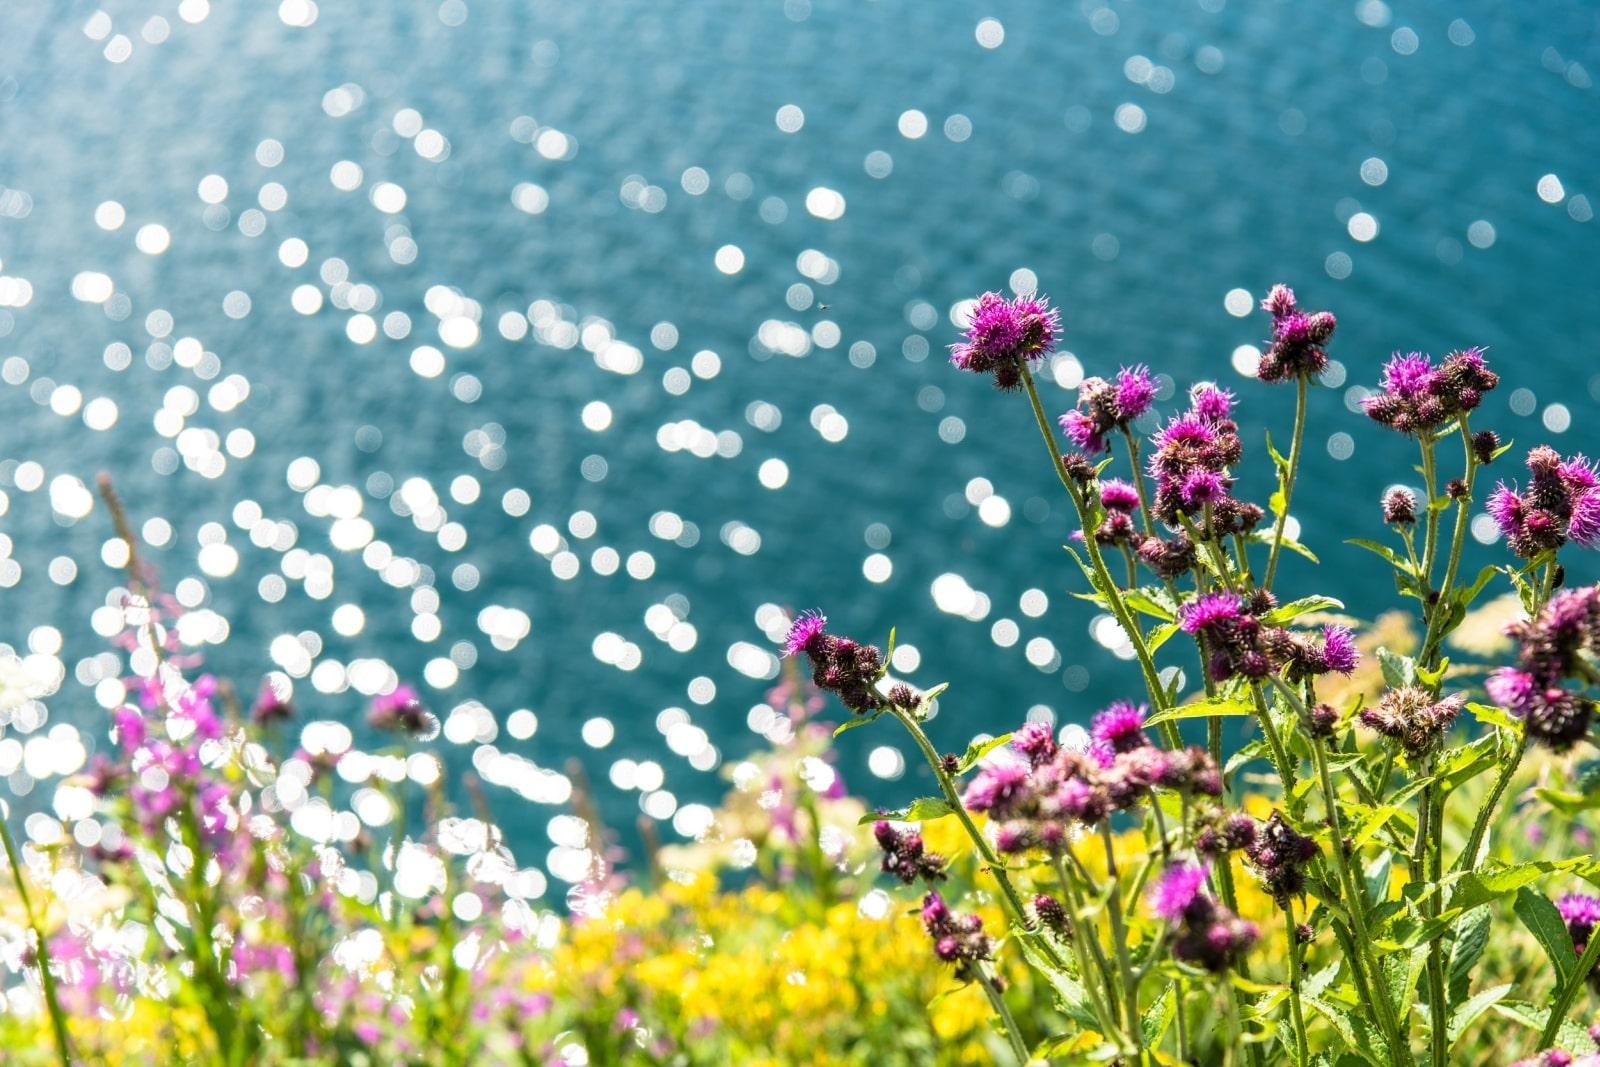 Heidi-Chalet-Falkert-Heidialm-Falkertsee-Natur-Wandern-Blumen